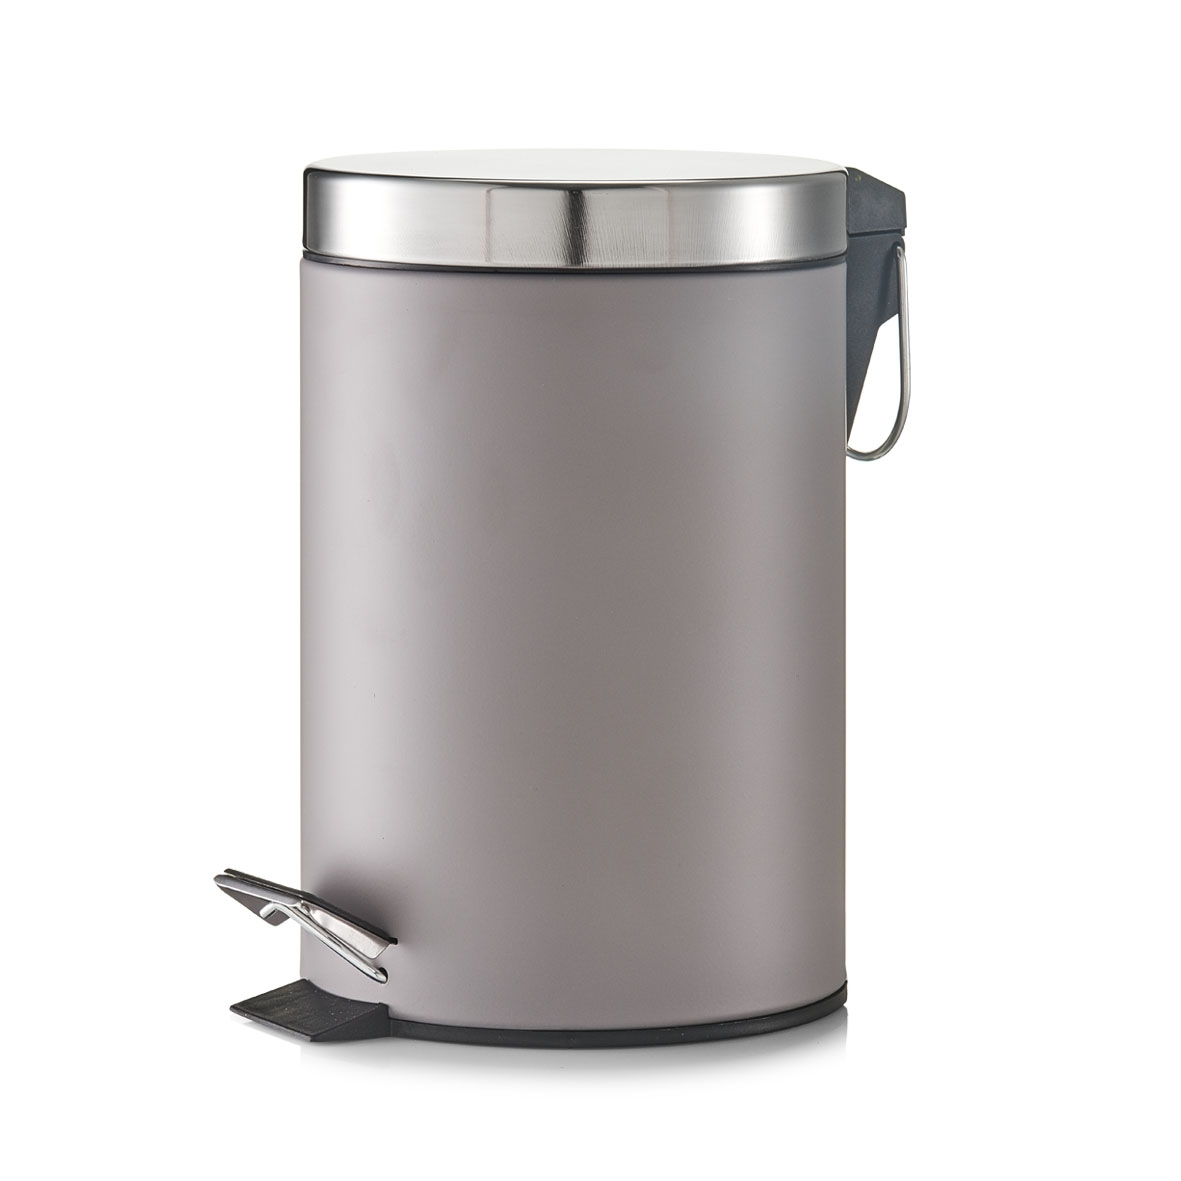 Cos de gunoi cu pedala pentru baie, Metal, Capac argintiu, 3L-Gri